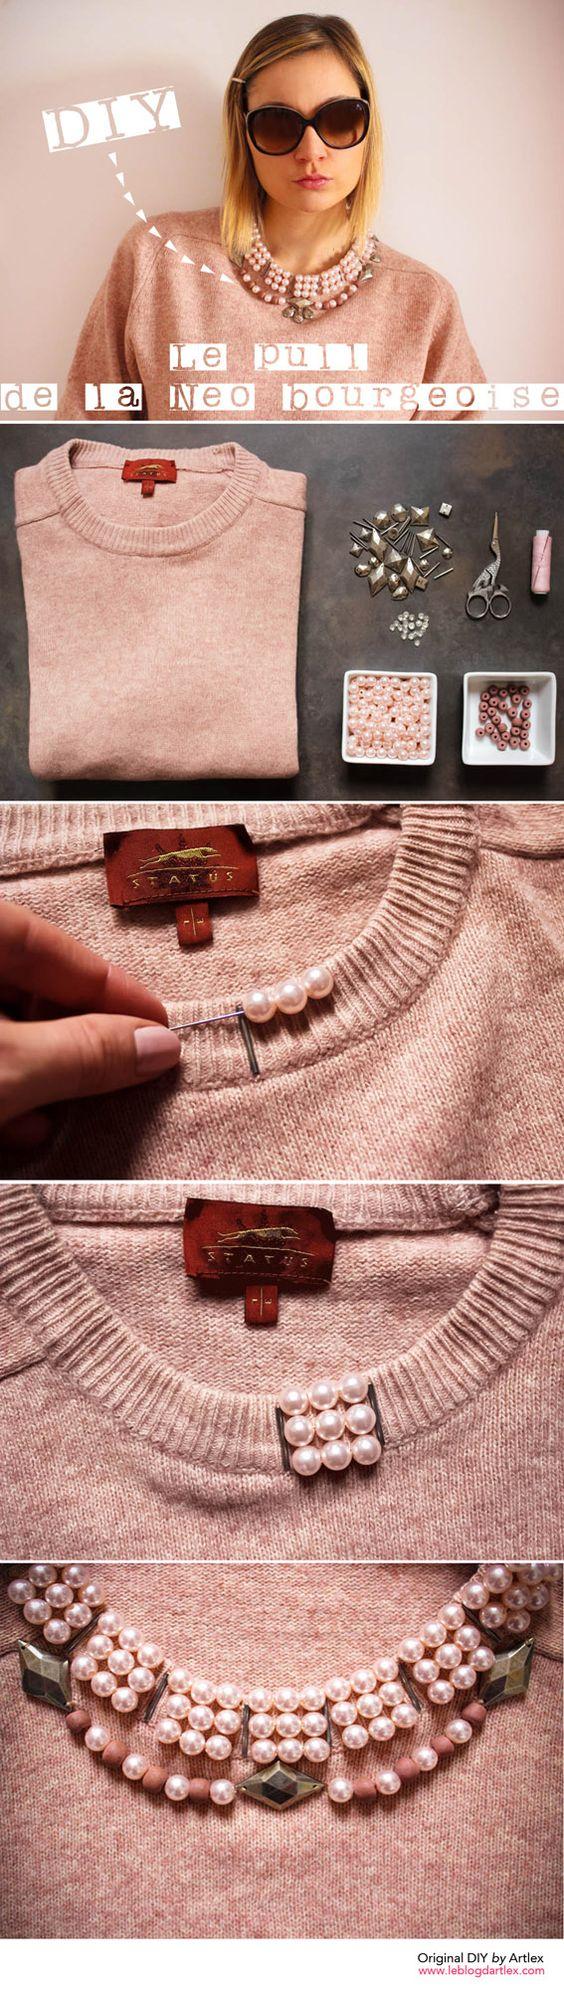 Pearl collar DIY // DIY pull col perlé // Blog mode et DIY Artlex: